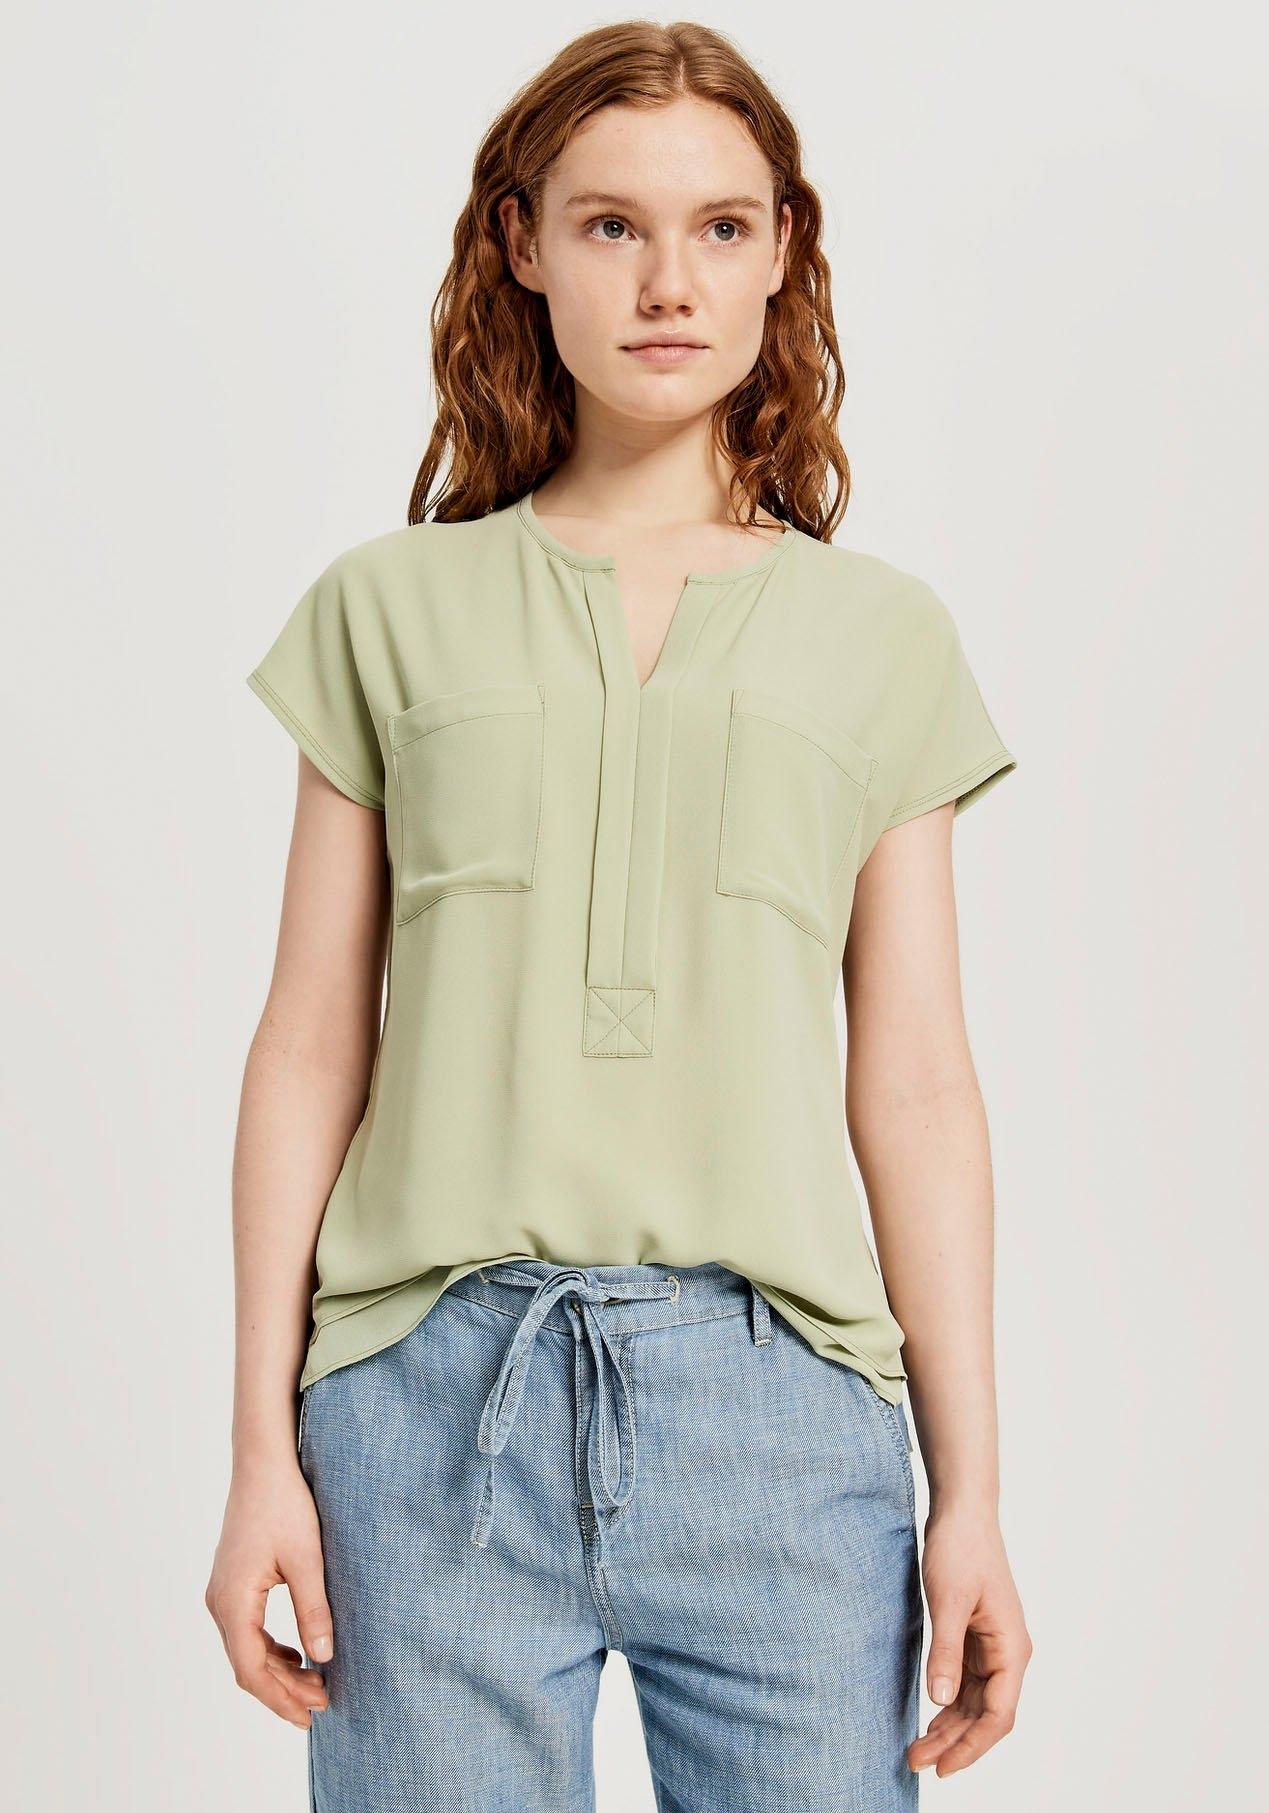 OPUS blouse met korte mouwen Flusi In laagjes-look nu online bestellen